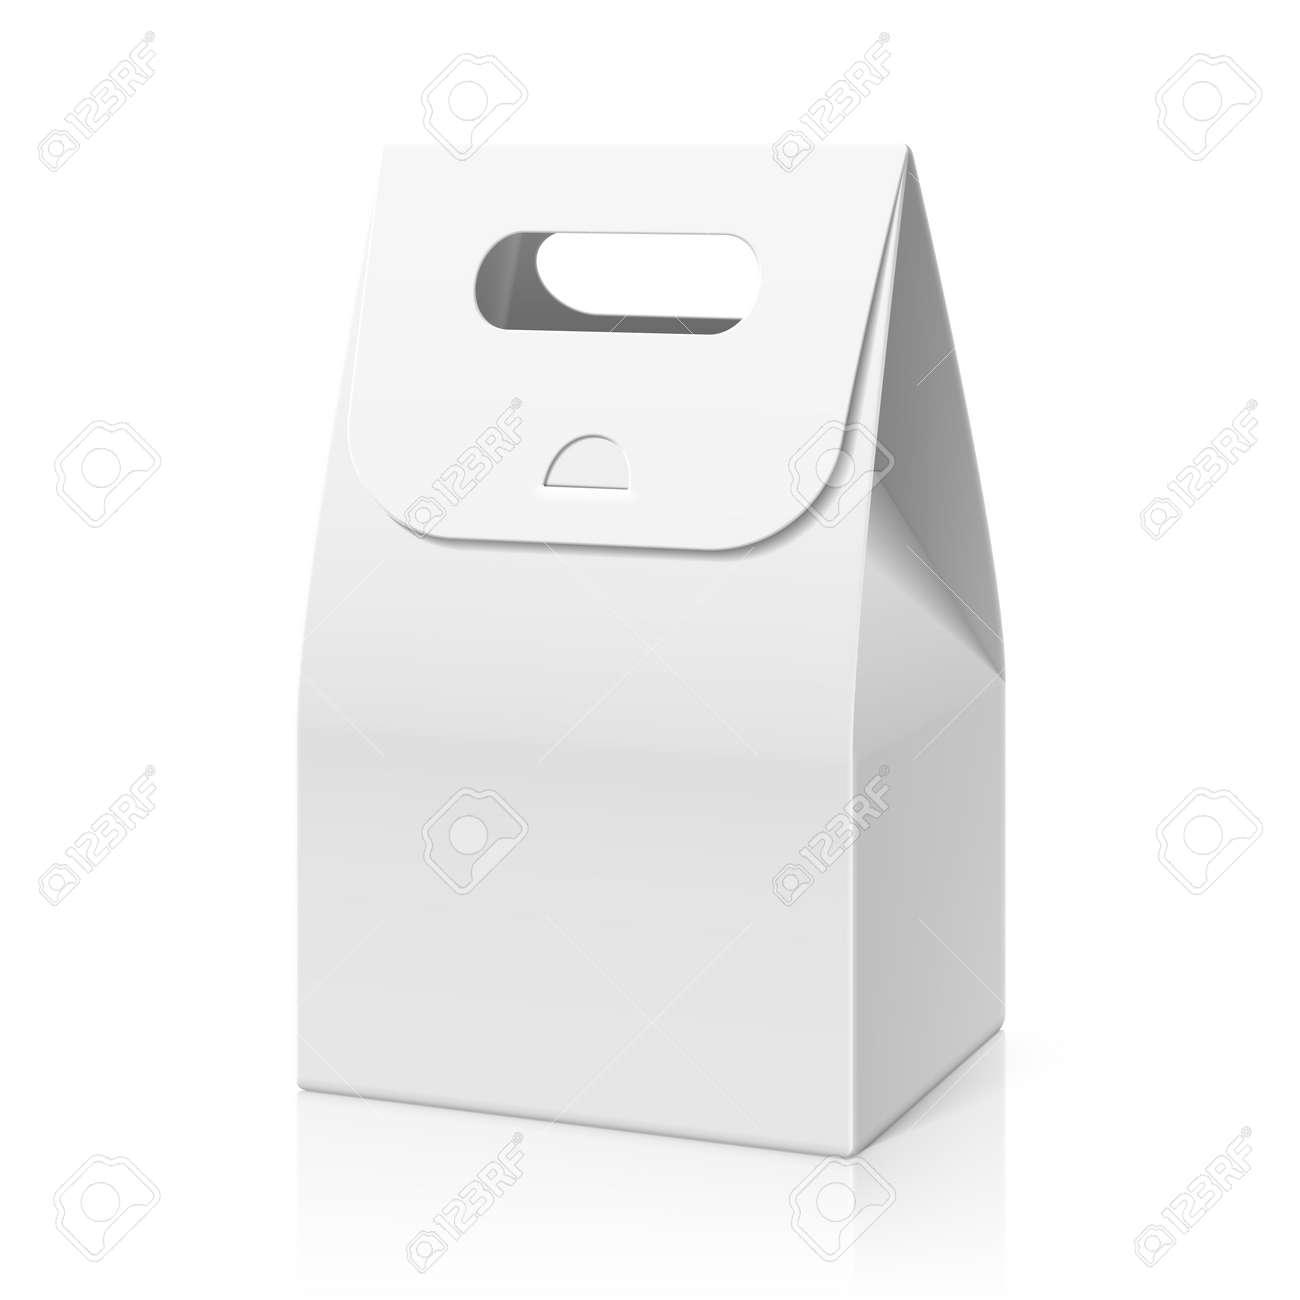 BlancPain Blanc En Gâteau Sac De Papier Emballage Main K3lcT1JF